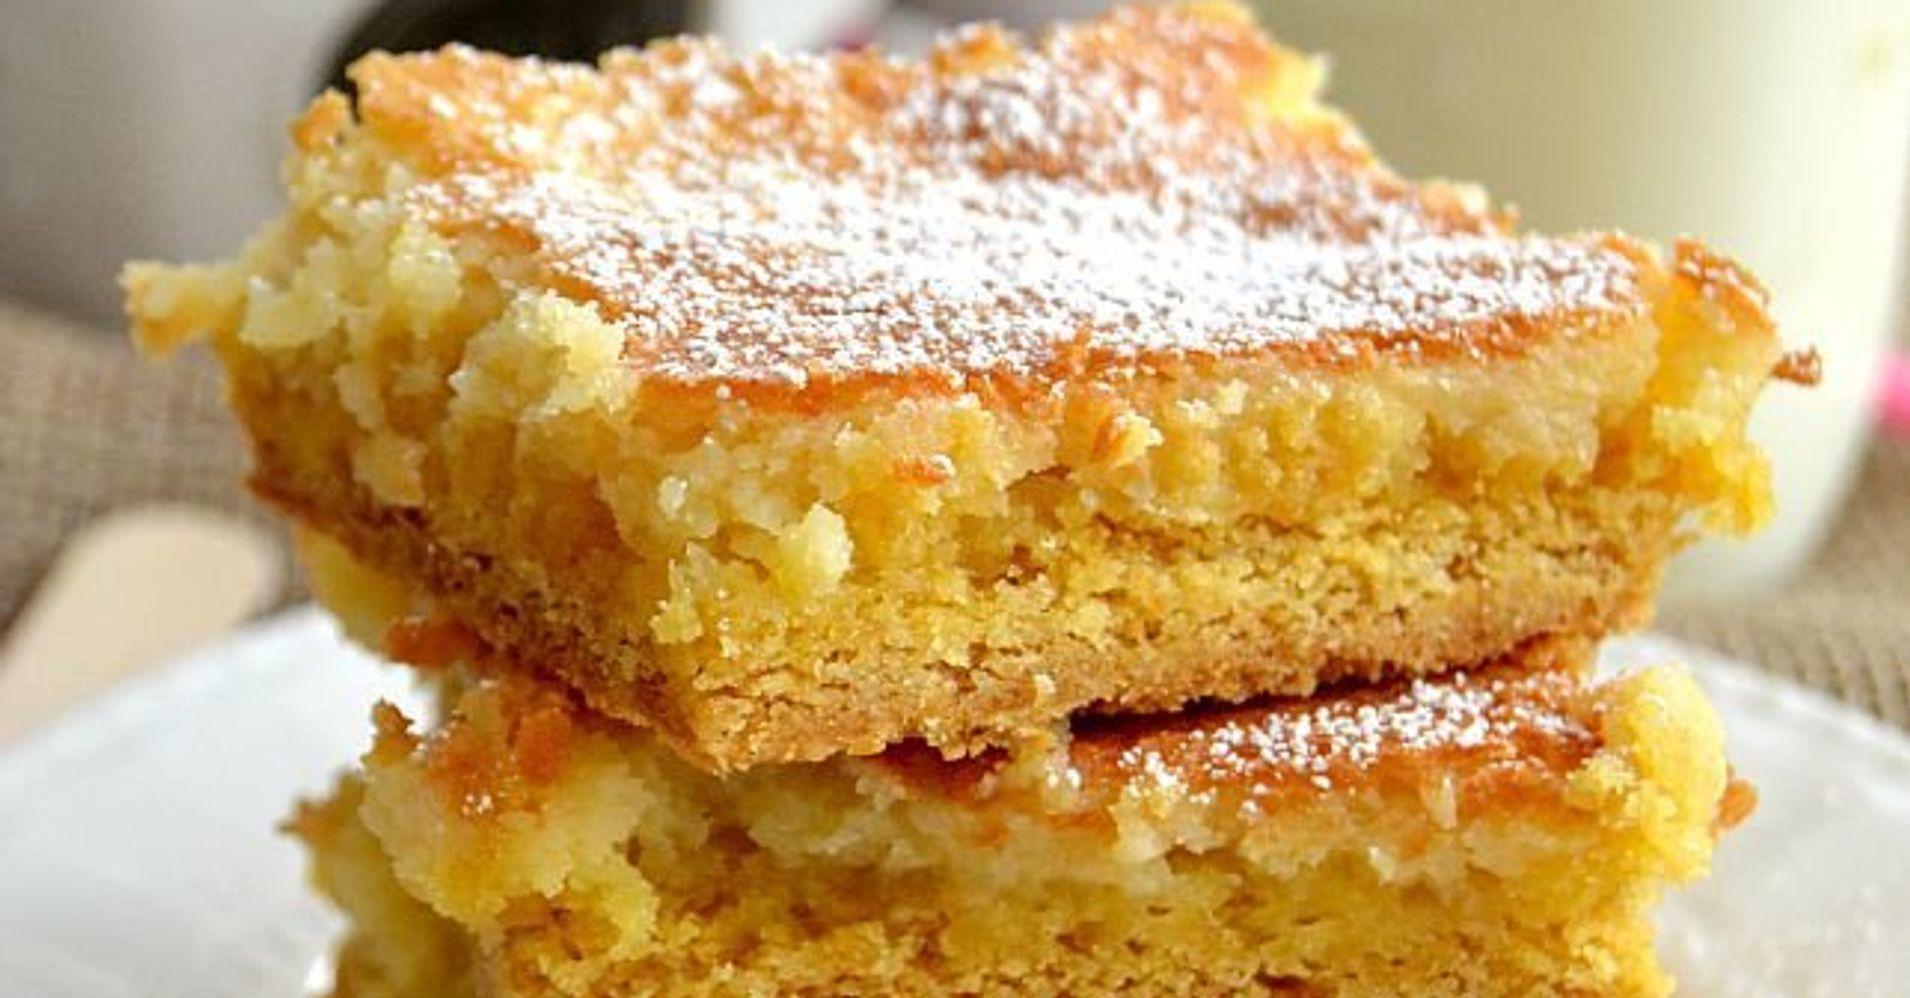 Gooey Cake Variations